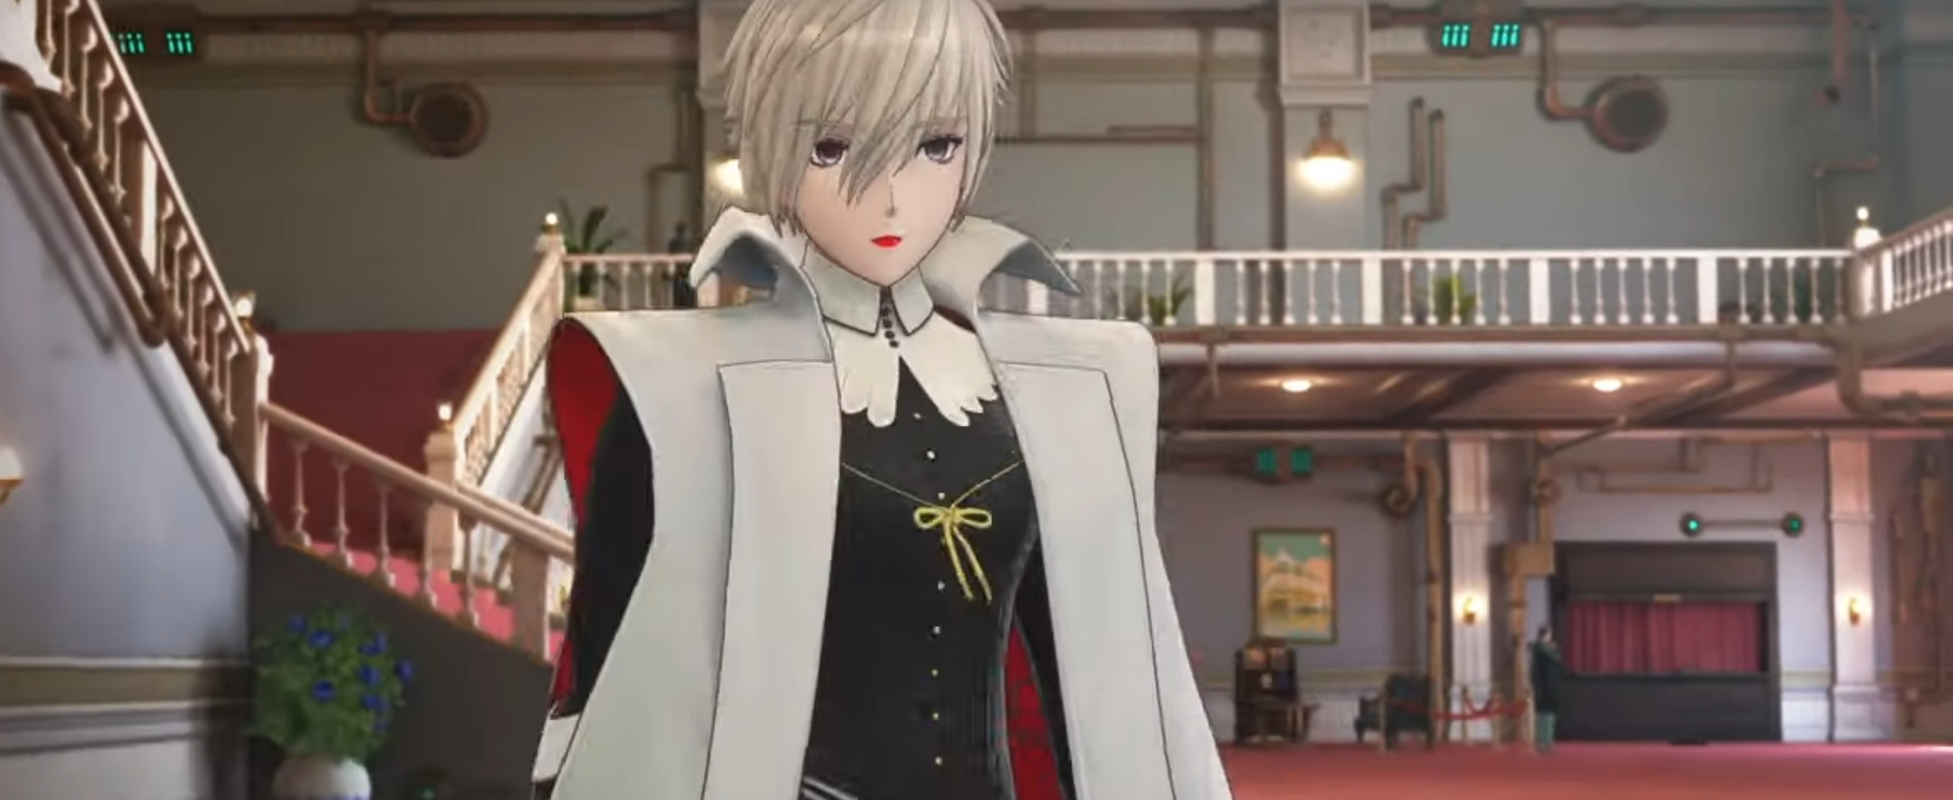 Persona Artist Created Original Character For Project Sakura Wars